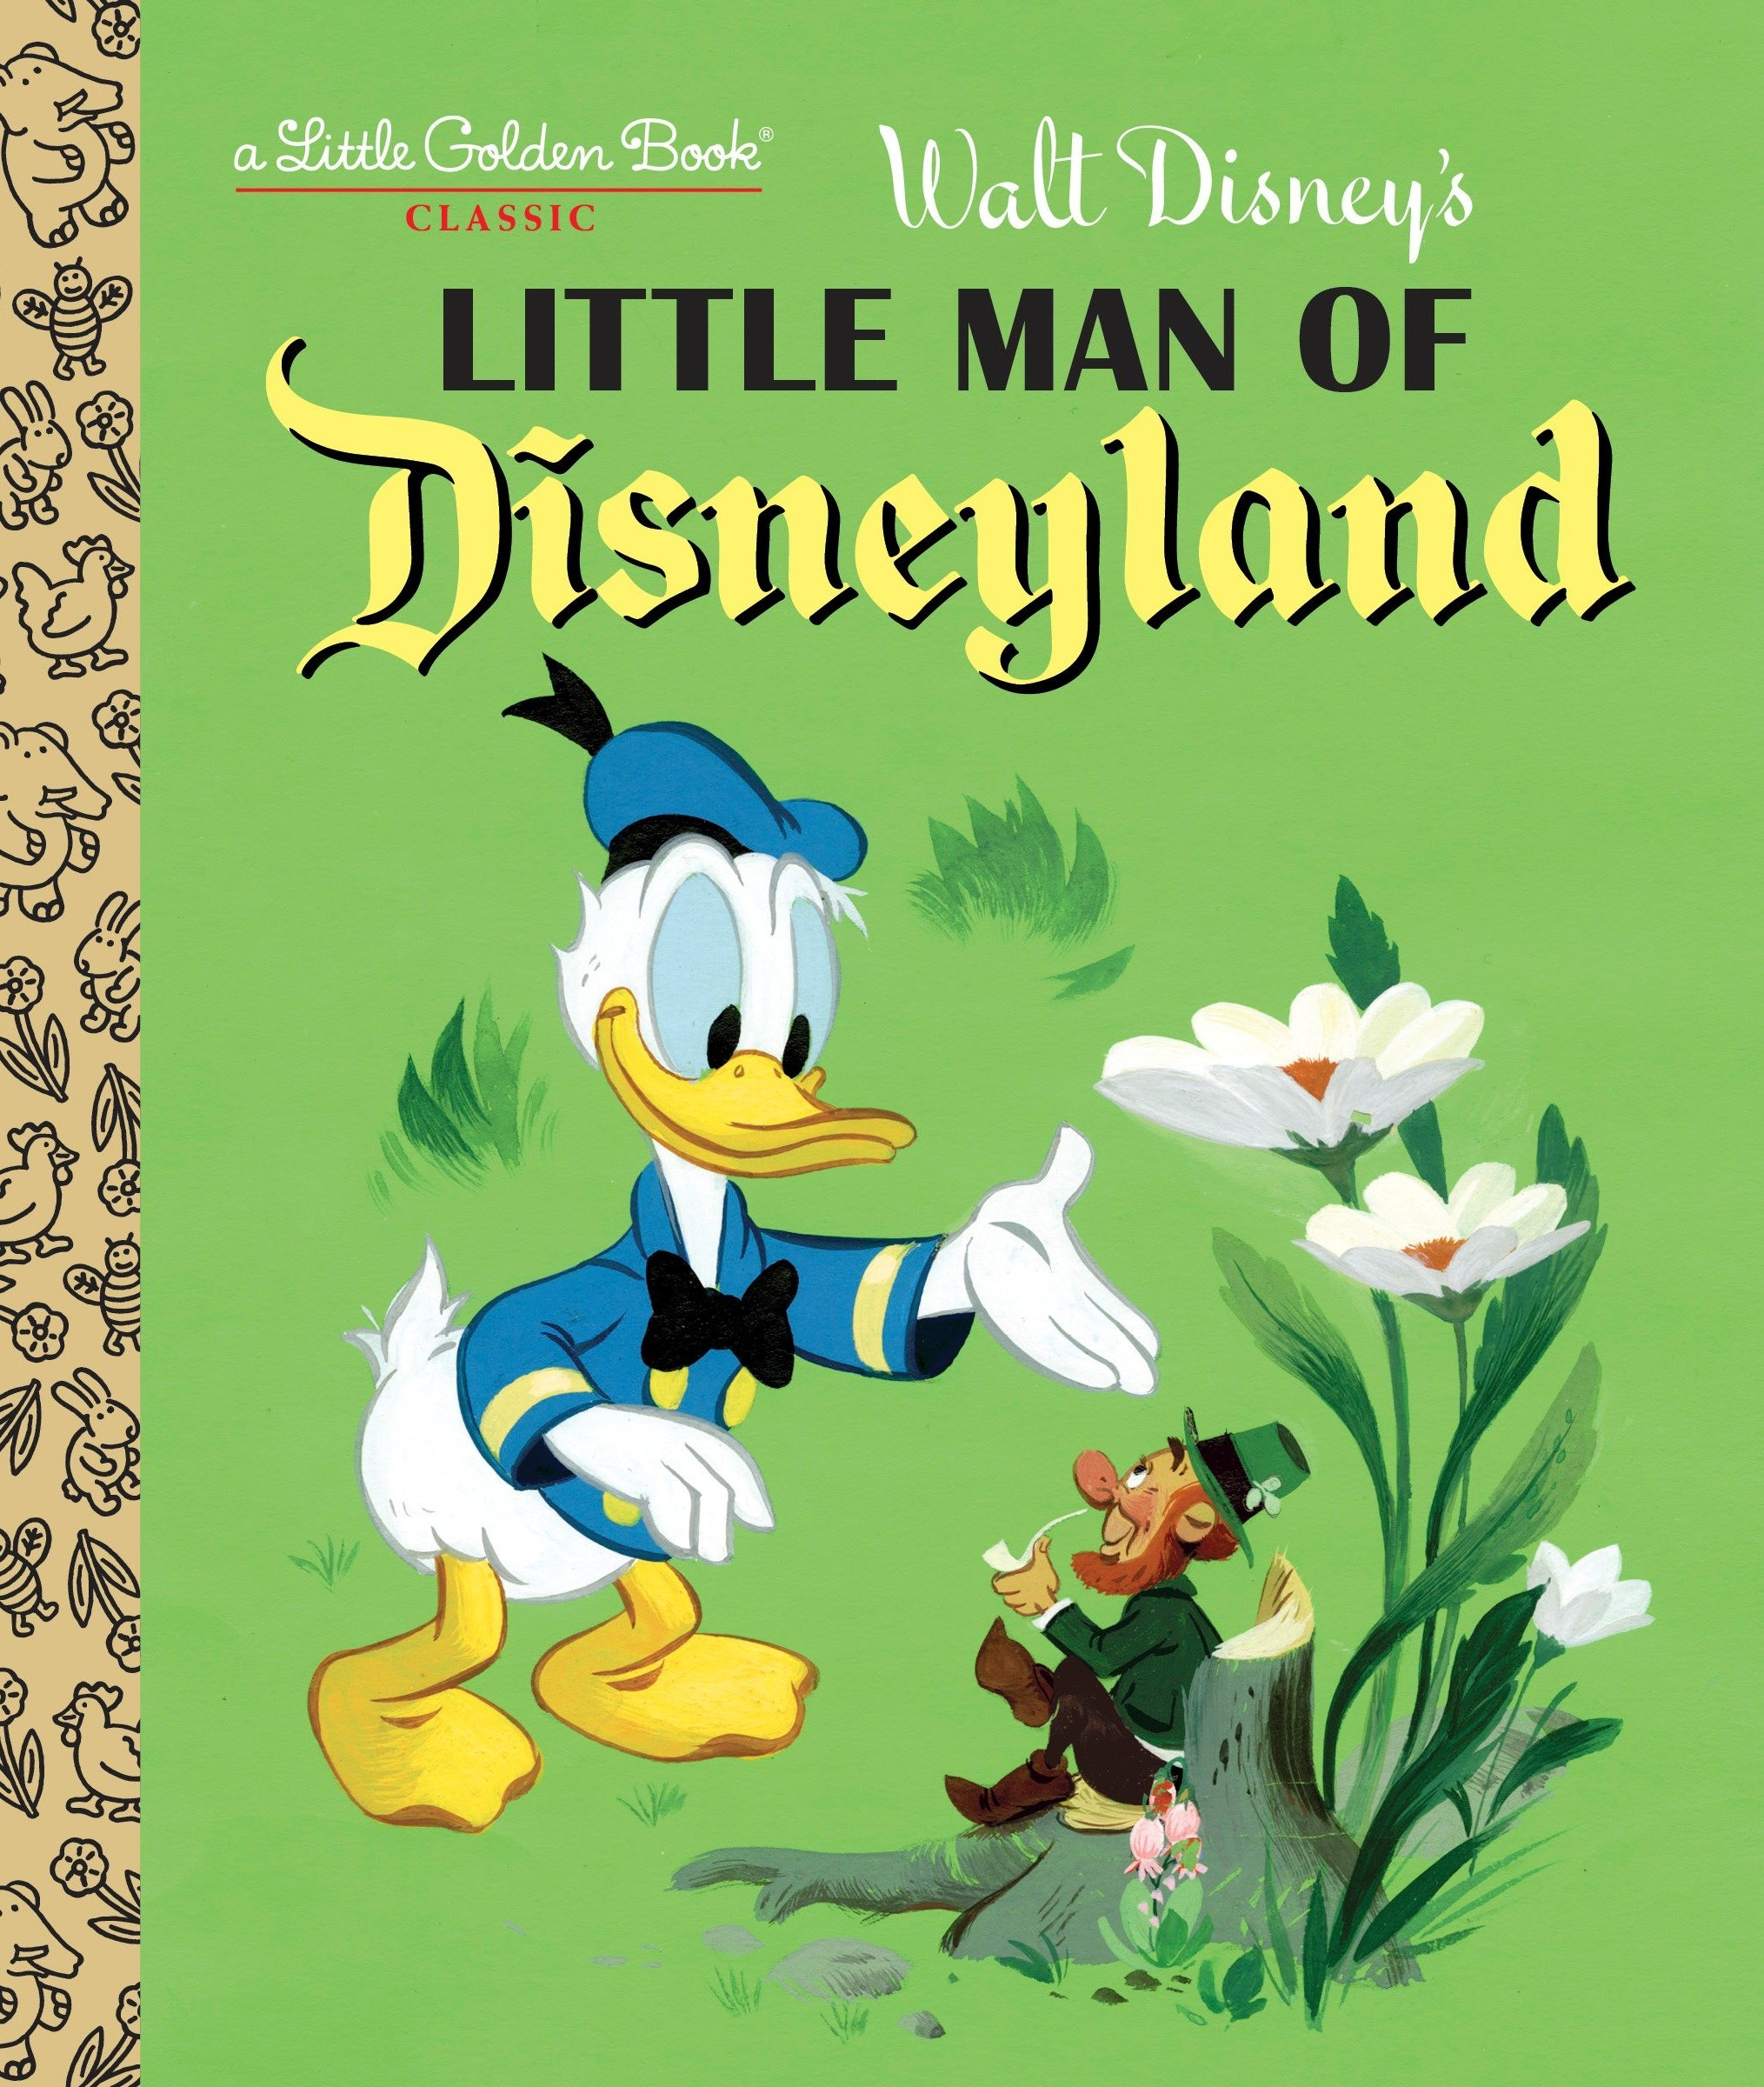 Little Man of Disneyland (Disney Classic) (Little Golden Book): RH Disney, Walt Disney Studio: 9780736434850: Amazon.com: Books